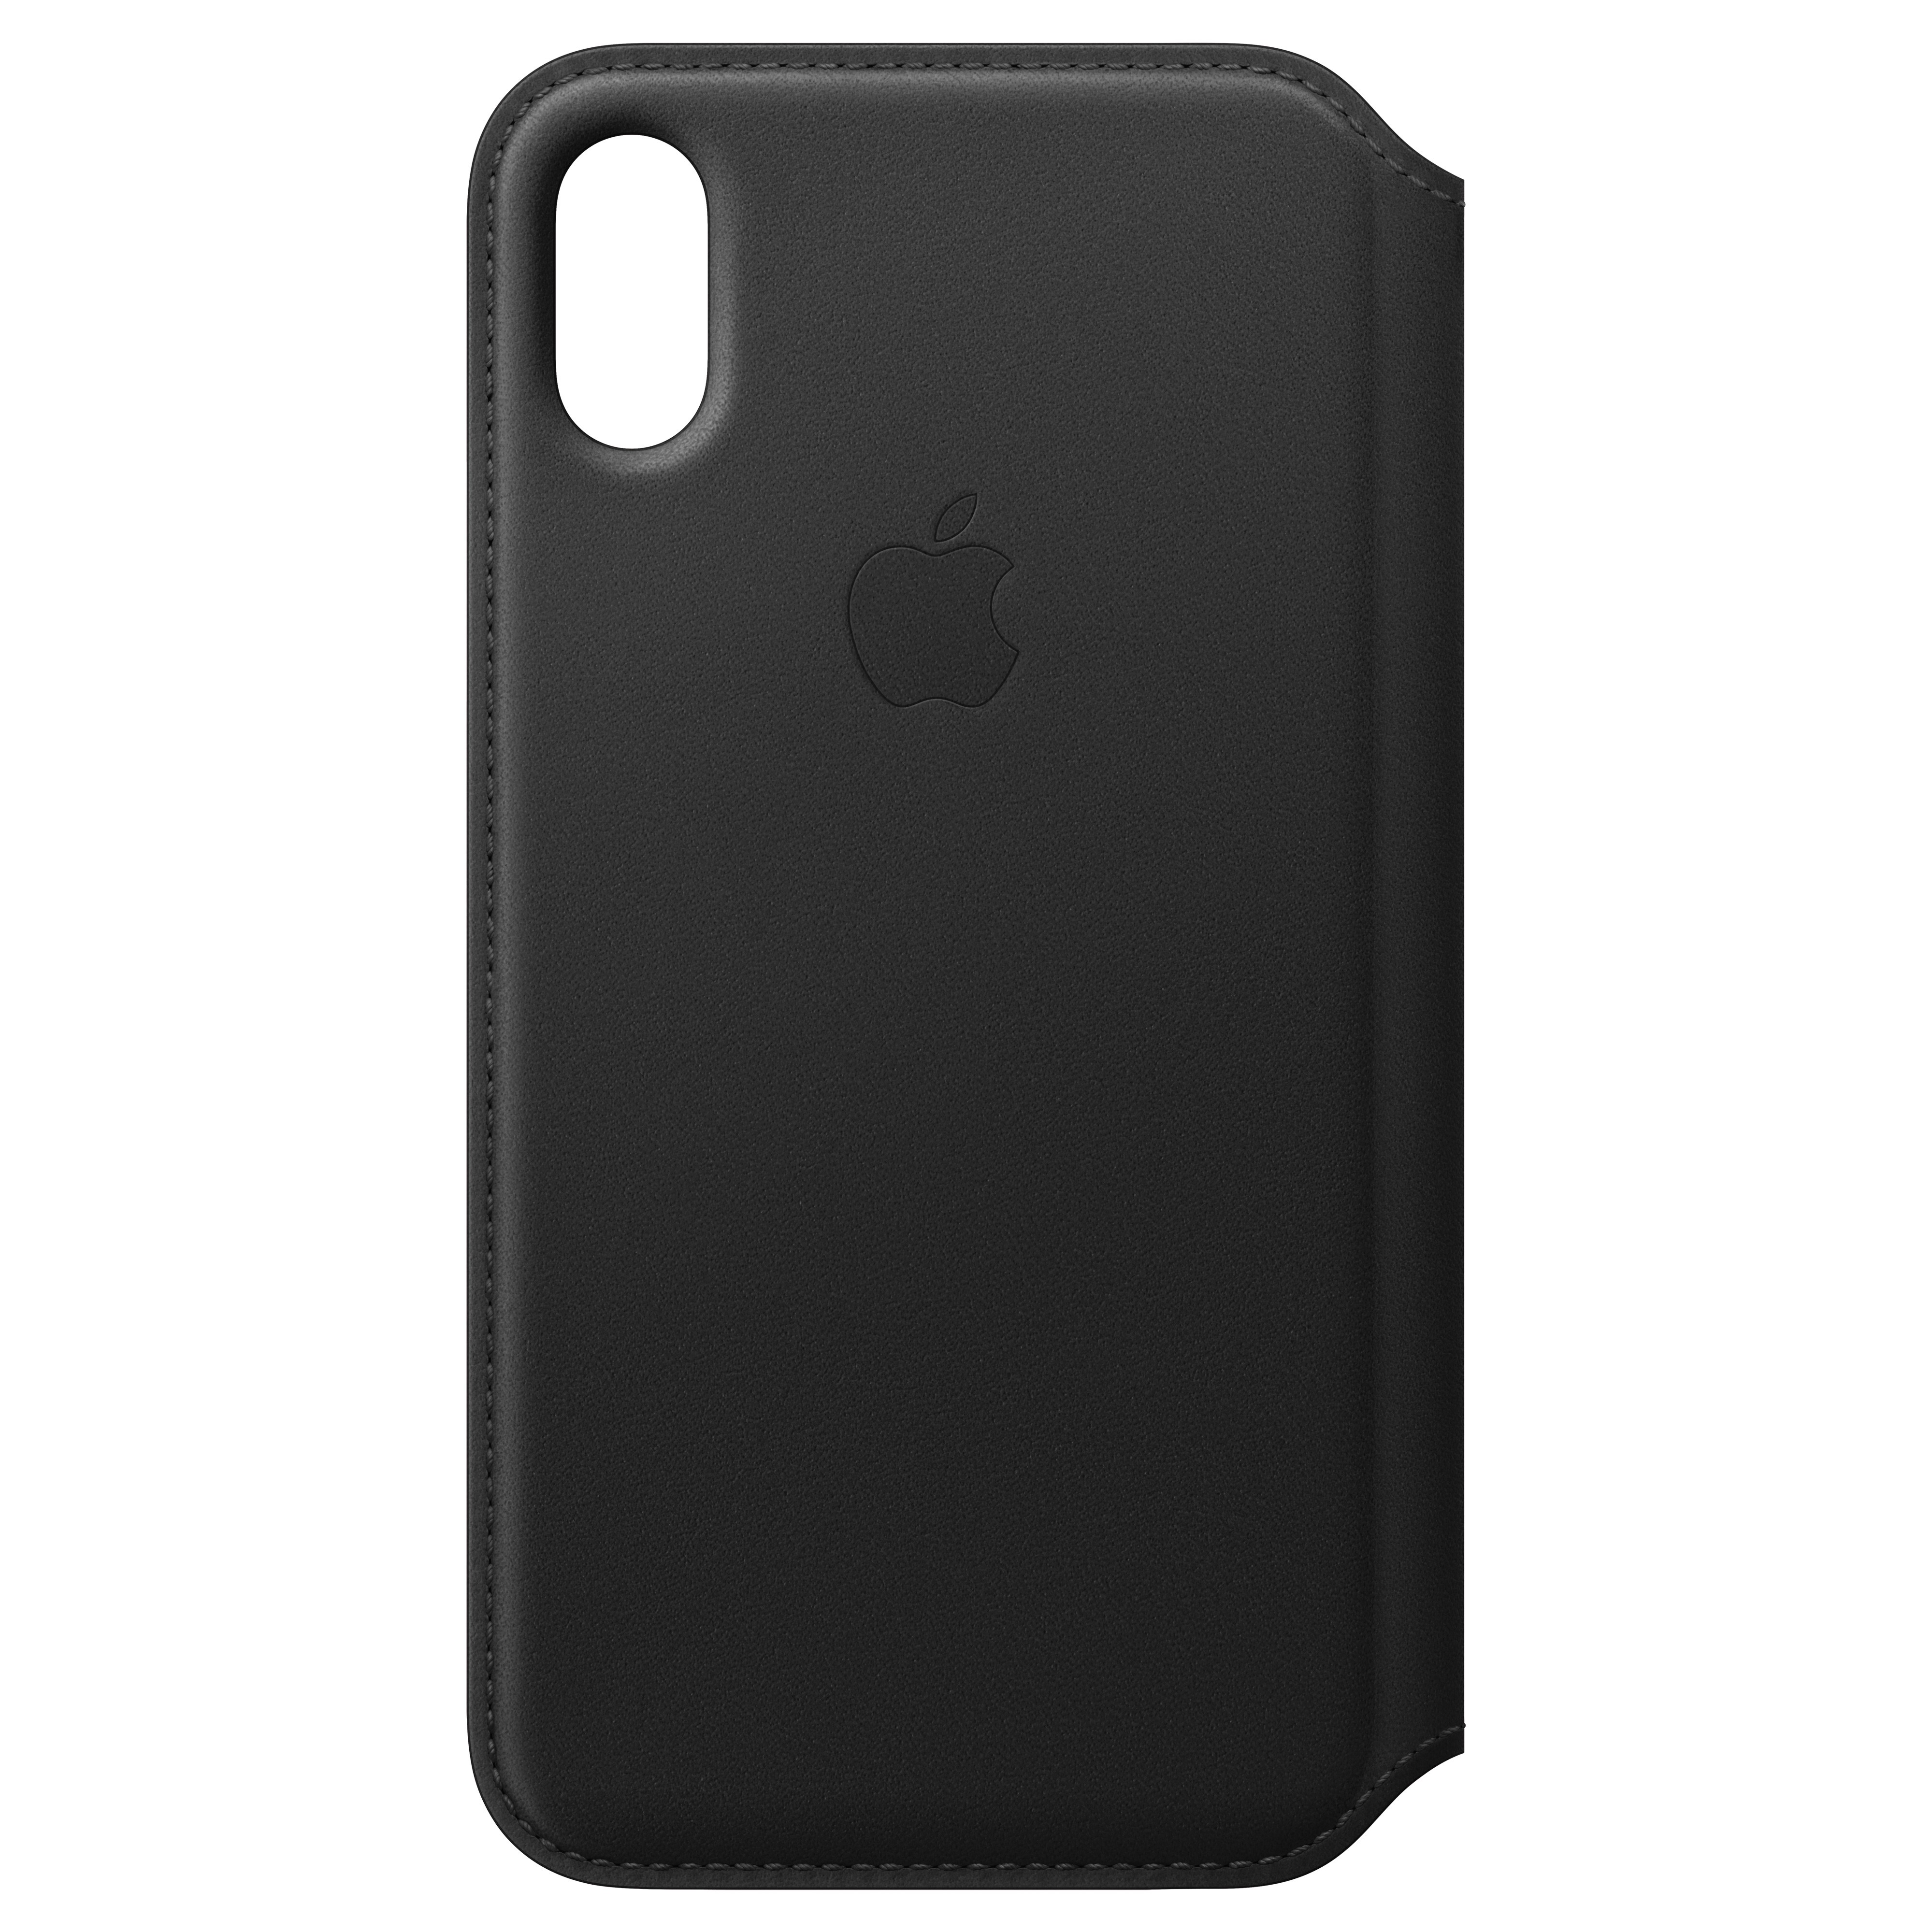 MQRV2ZM/A : iPhone X Folio skinndeksel (sort)